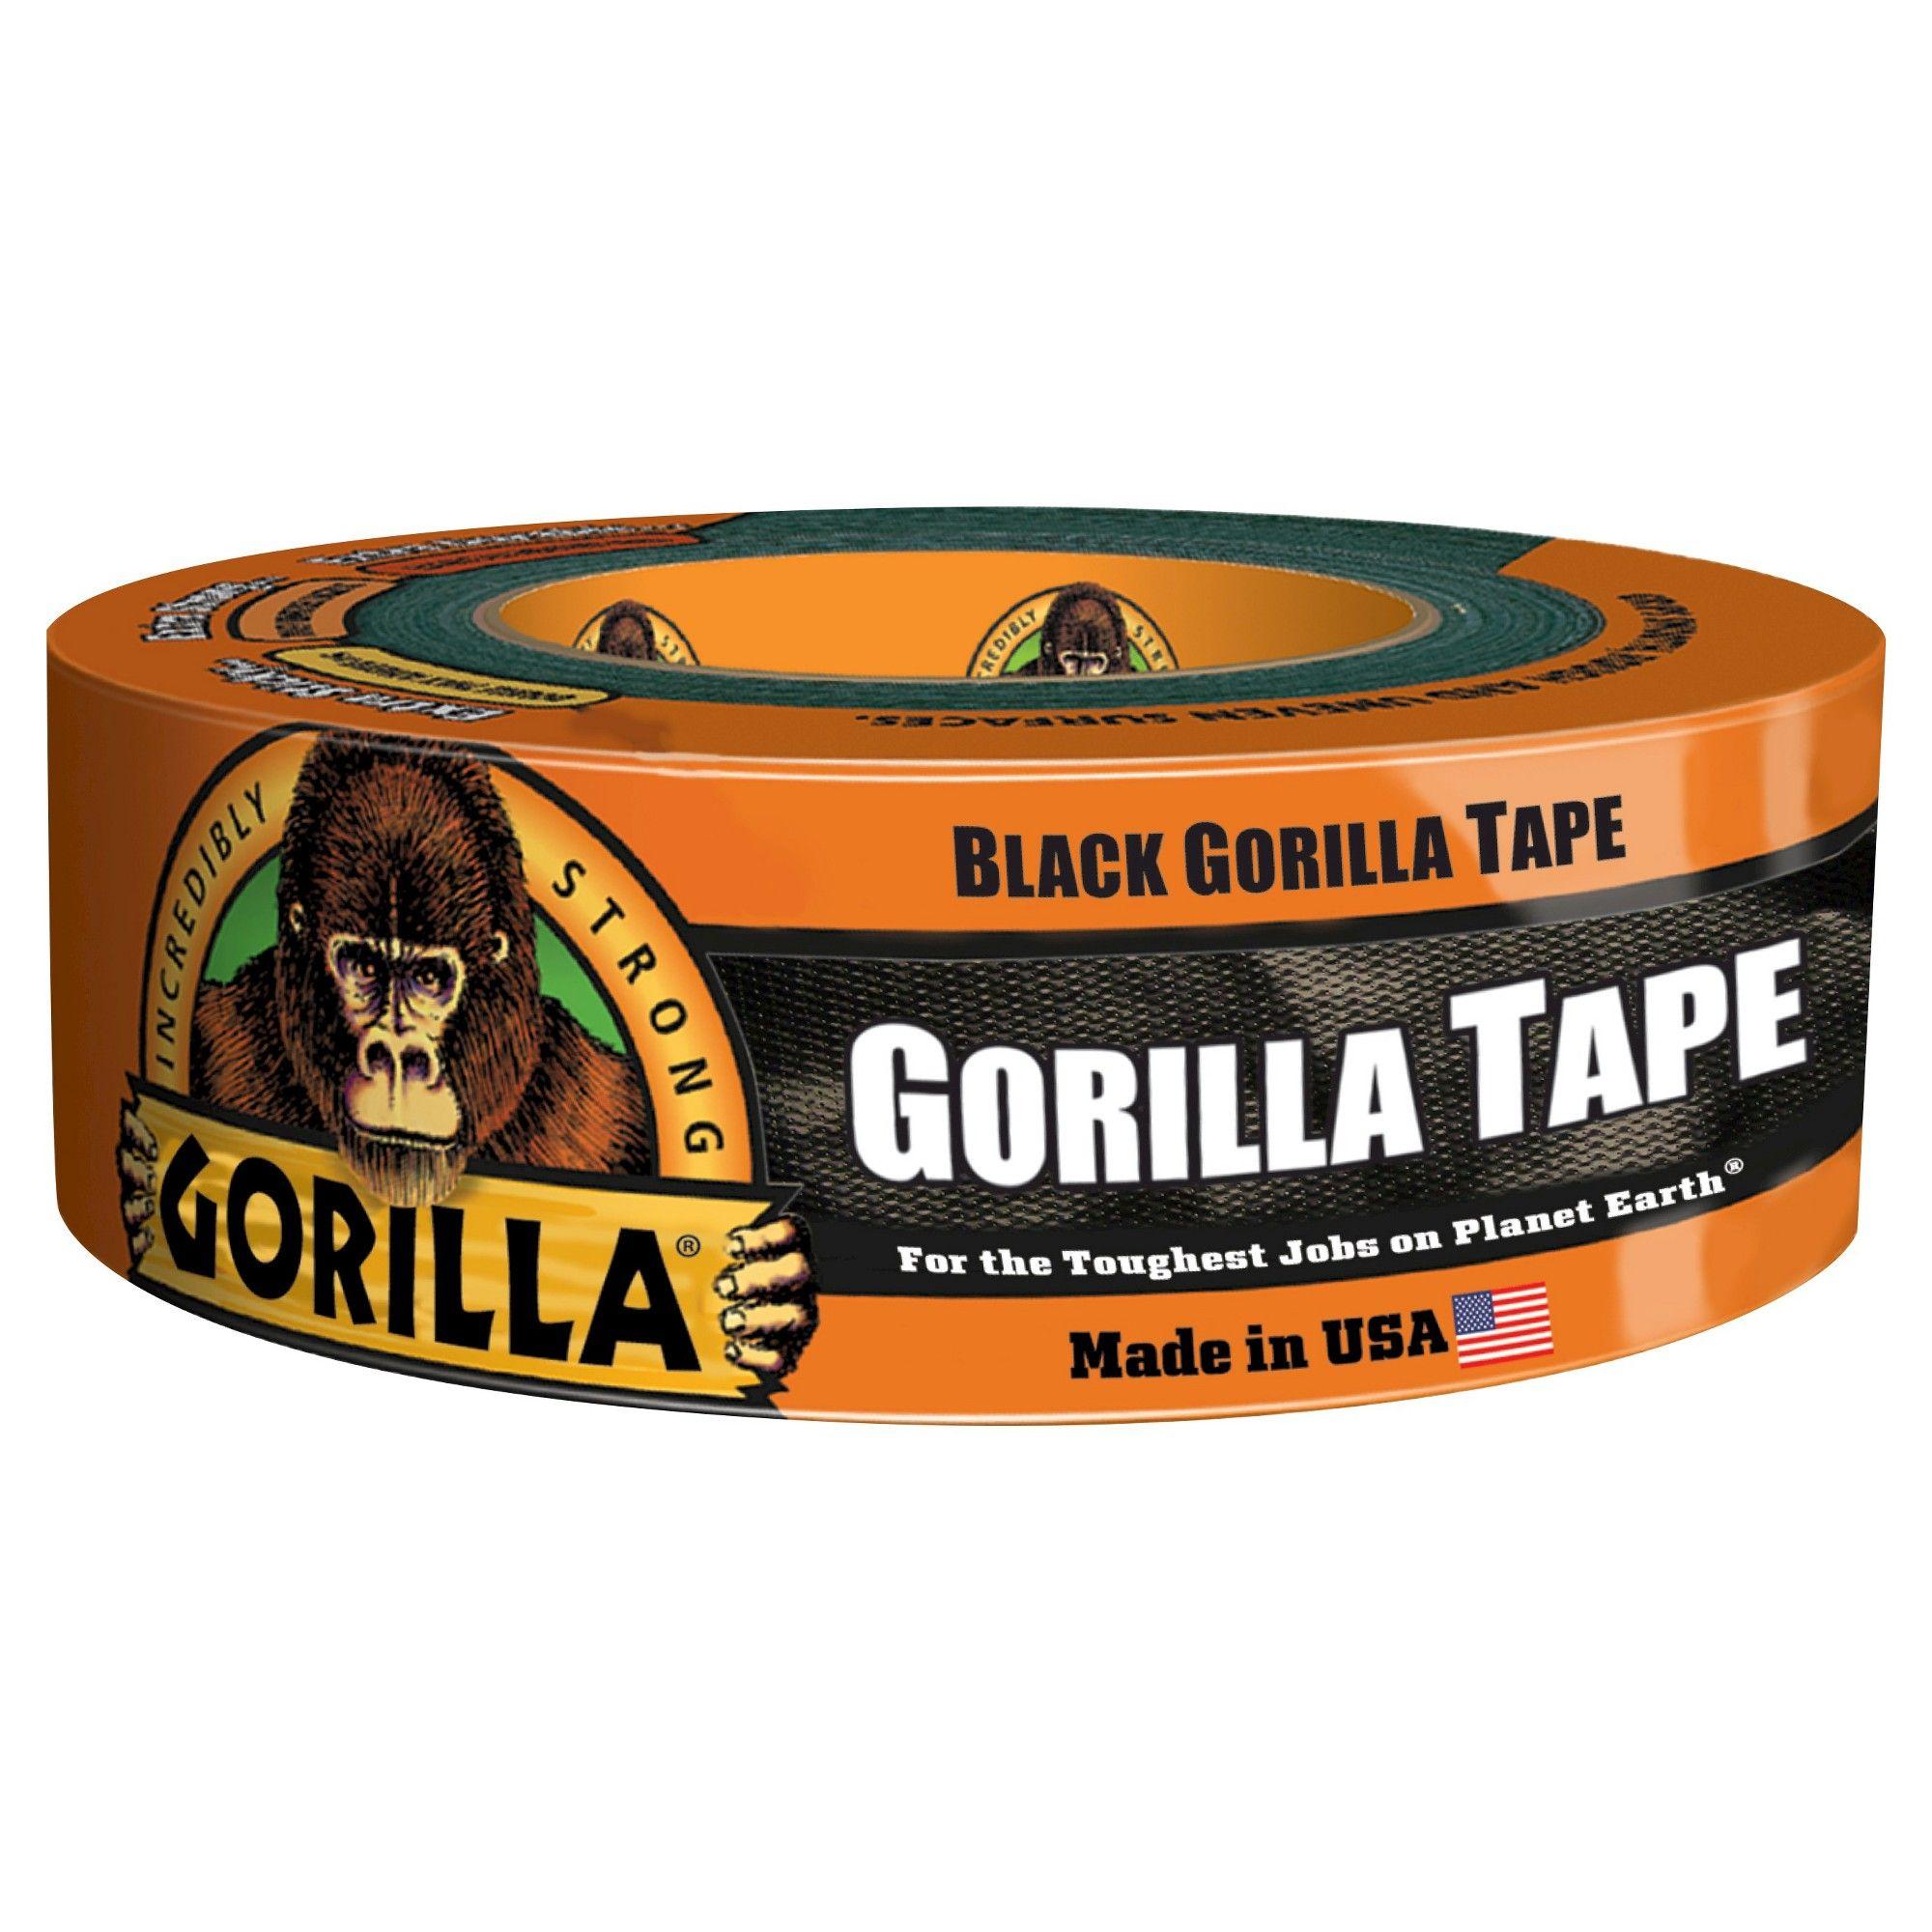 35yd Black Gorilla Tape, Duct Tape Gorilla tape, Tape